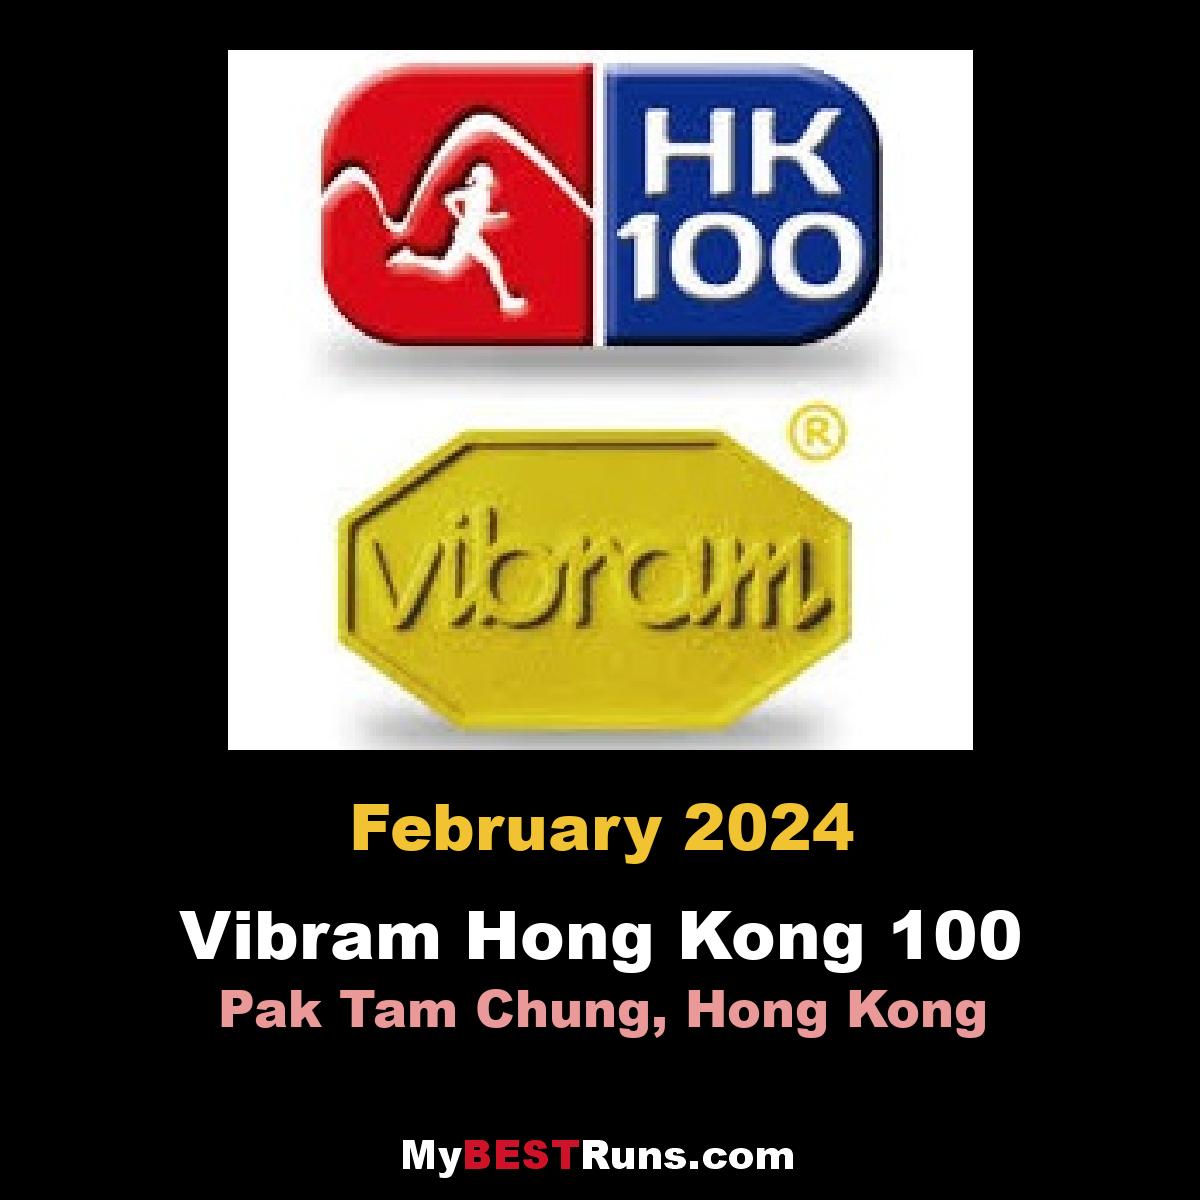 Vibram Hong Kong 100 Ultra trail